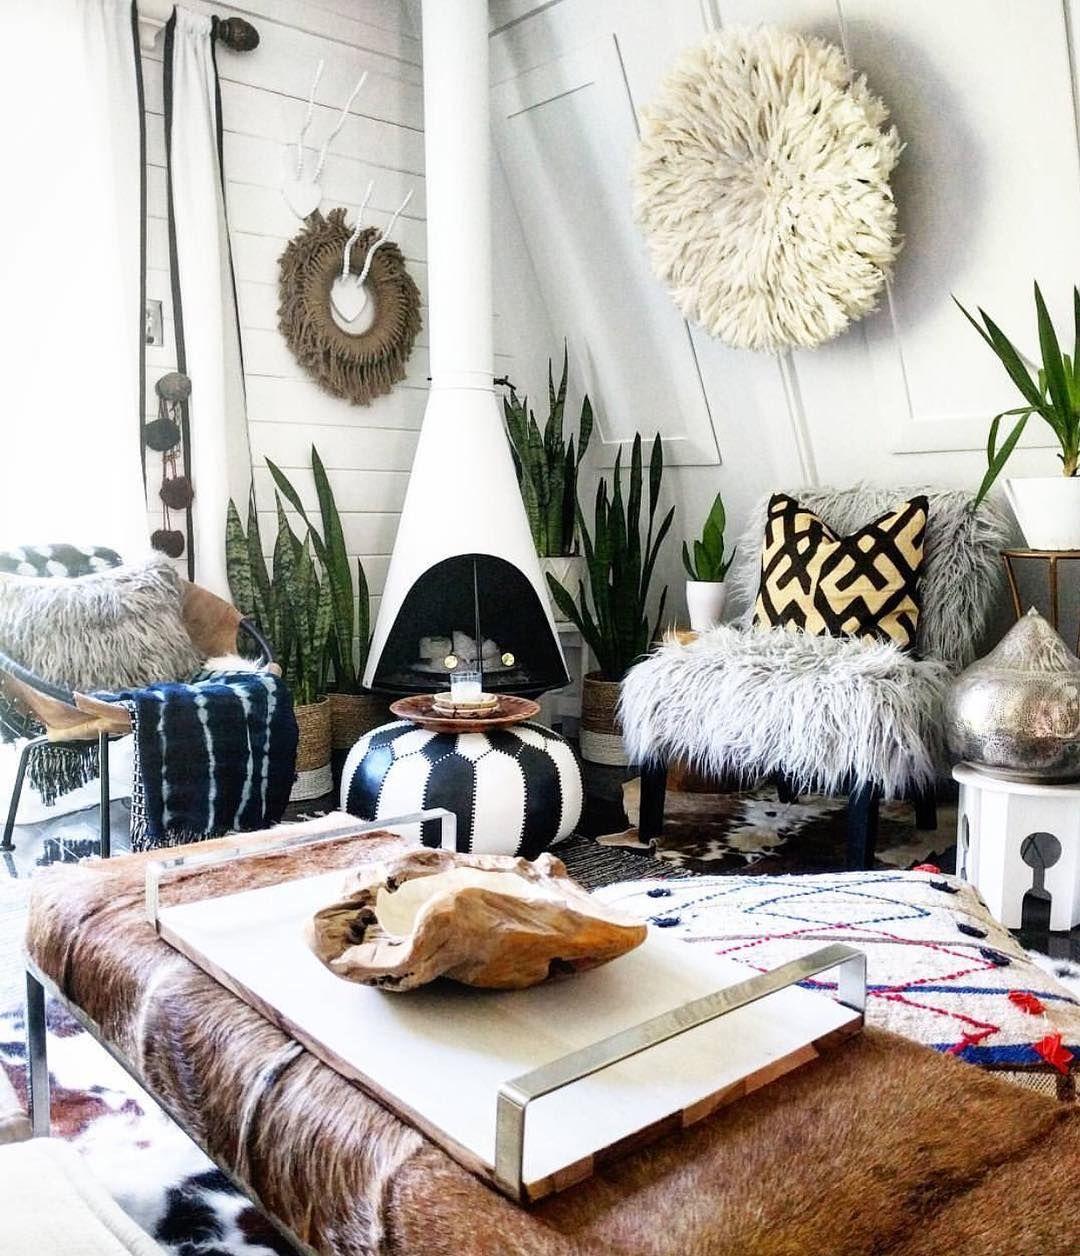 Pin de anna pisarchik en casa minimalista casa minimalista hogar y decoracion salones - Decoraciones para hogar ...